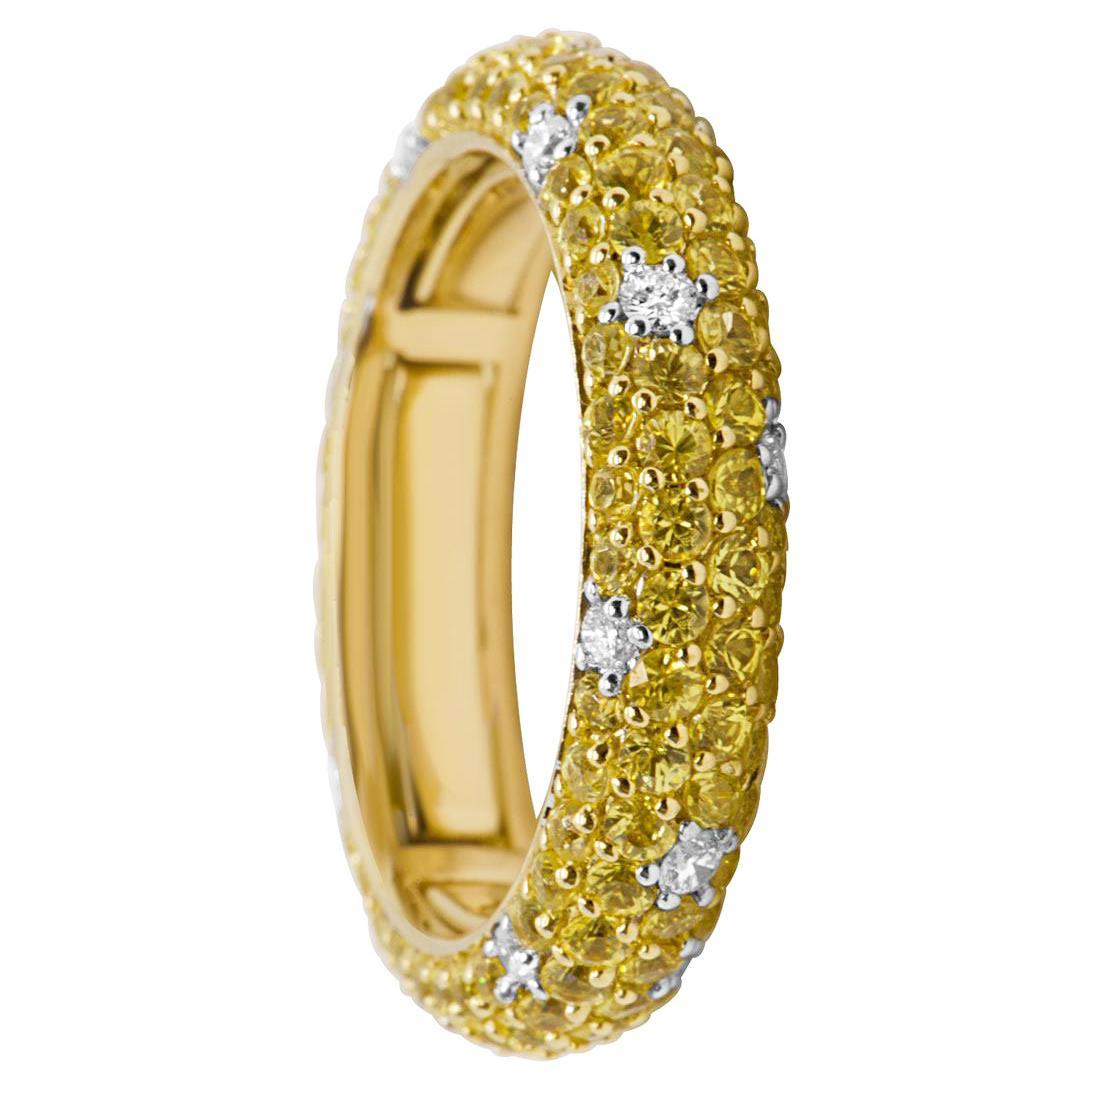 Anello eternity in oro giallo, mis 16 - ALFIERI & ST. JOHN